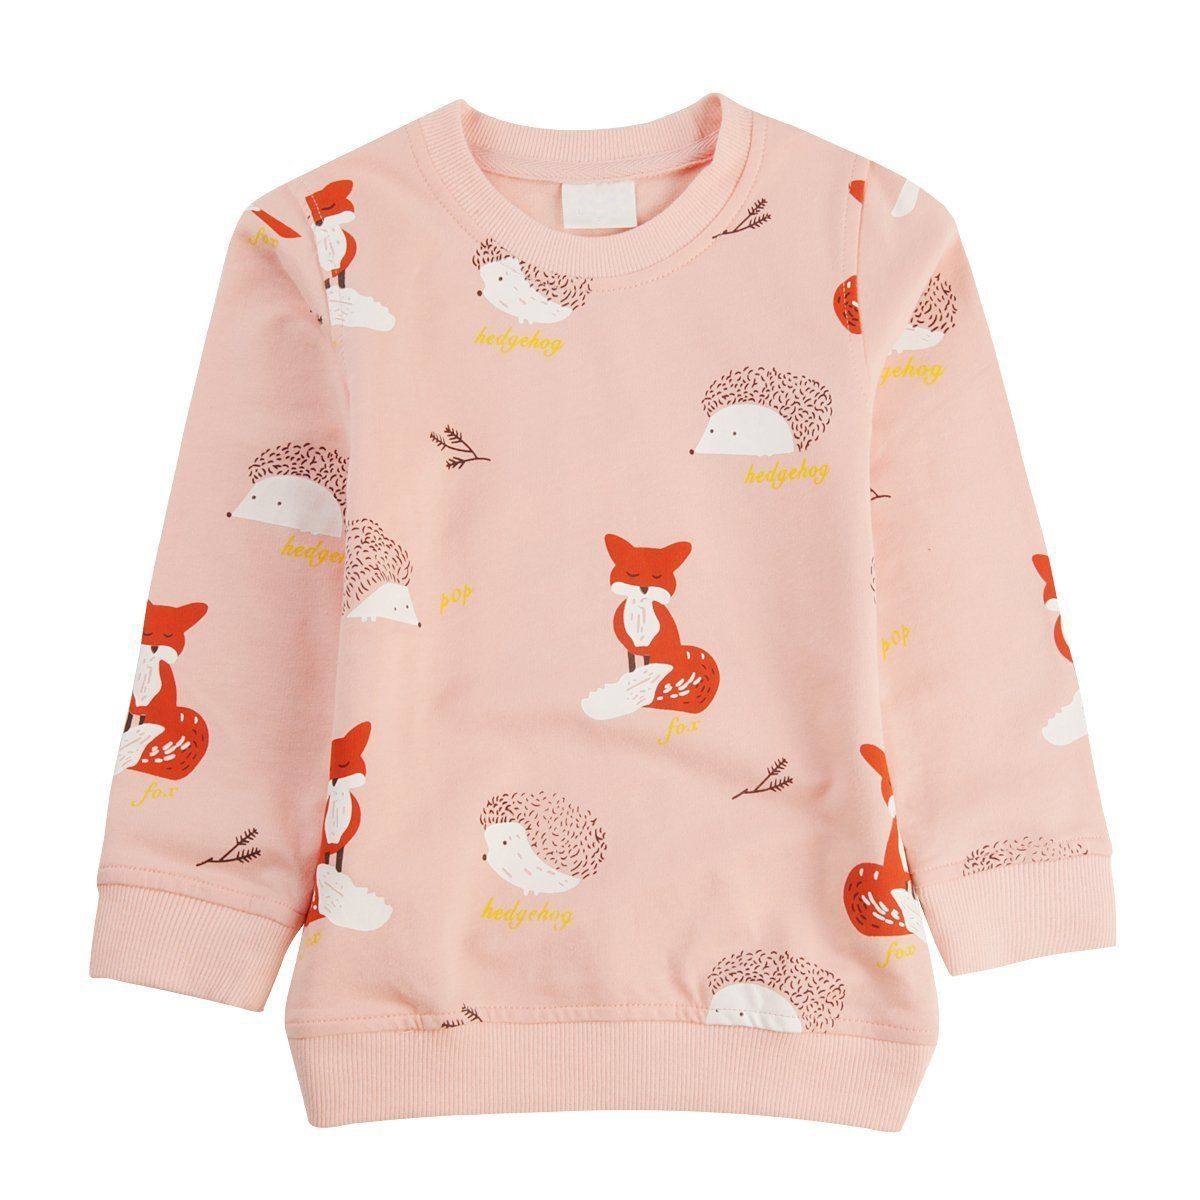 Toddler Girls Sweatshirt 100/% Cotton Crewneck Cute Cartoon Print Pink Sweatshirts Pullover Tops 2T